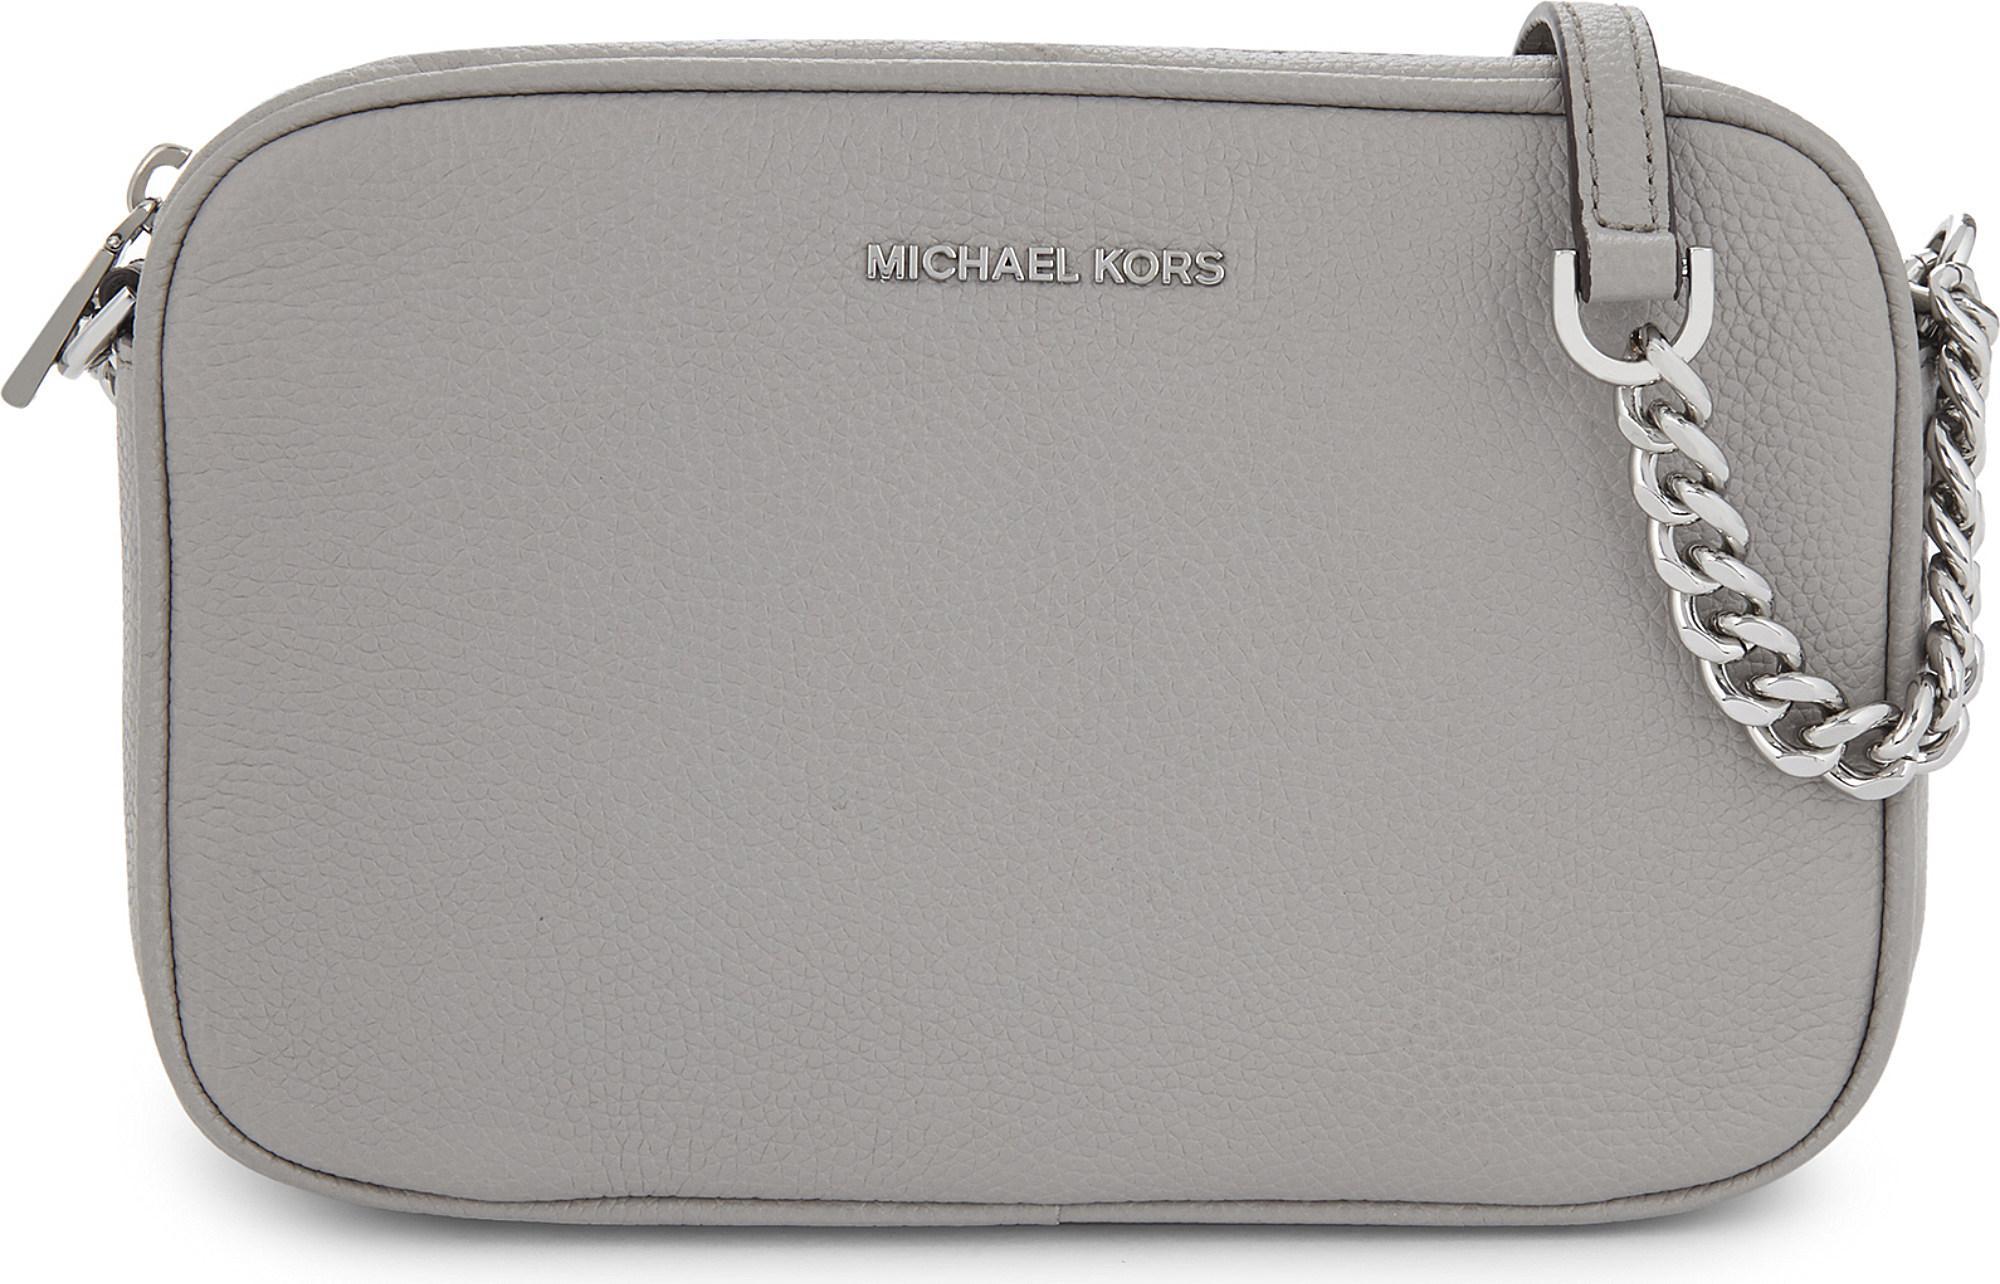 16f48df46b4d7 MICHAEL Michael Kors - Gray Ginny Medium Grained Leather Cross-body Bag -  Lyst